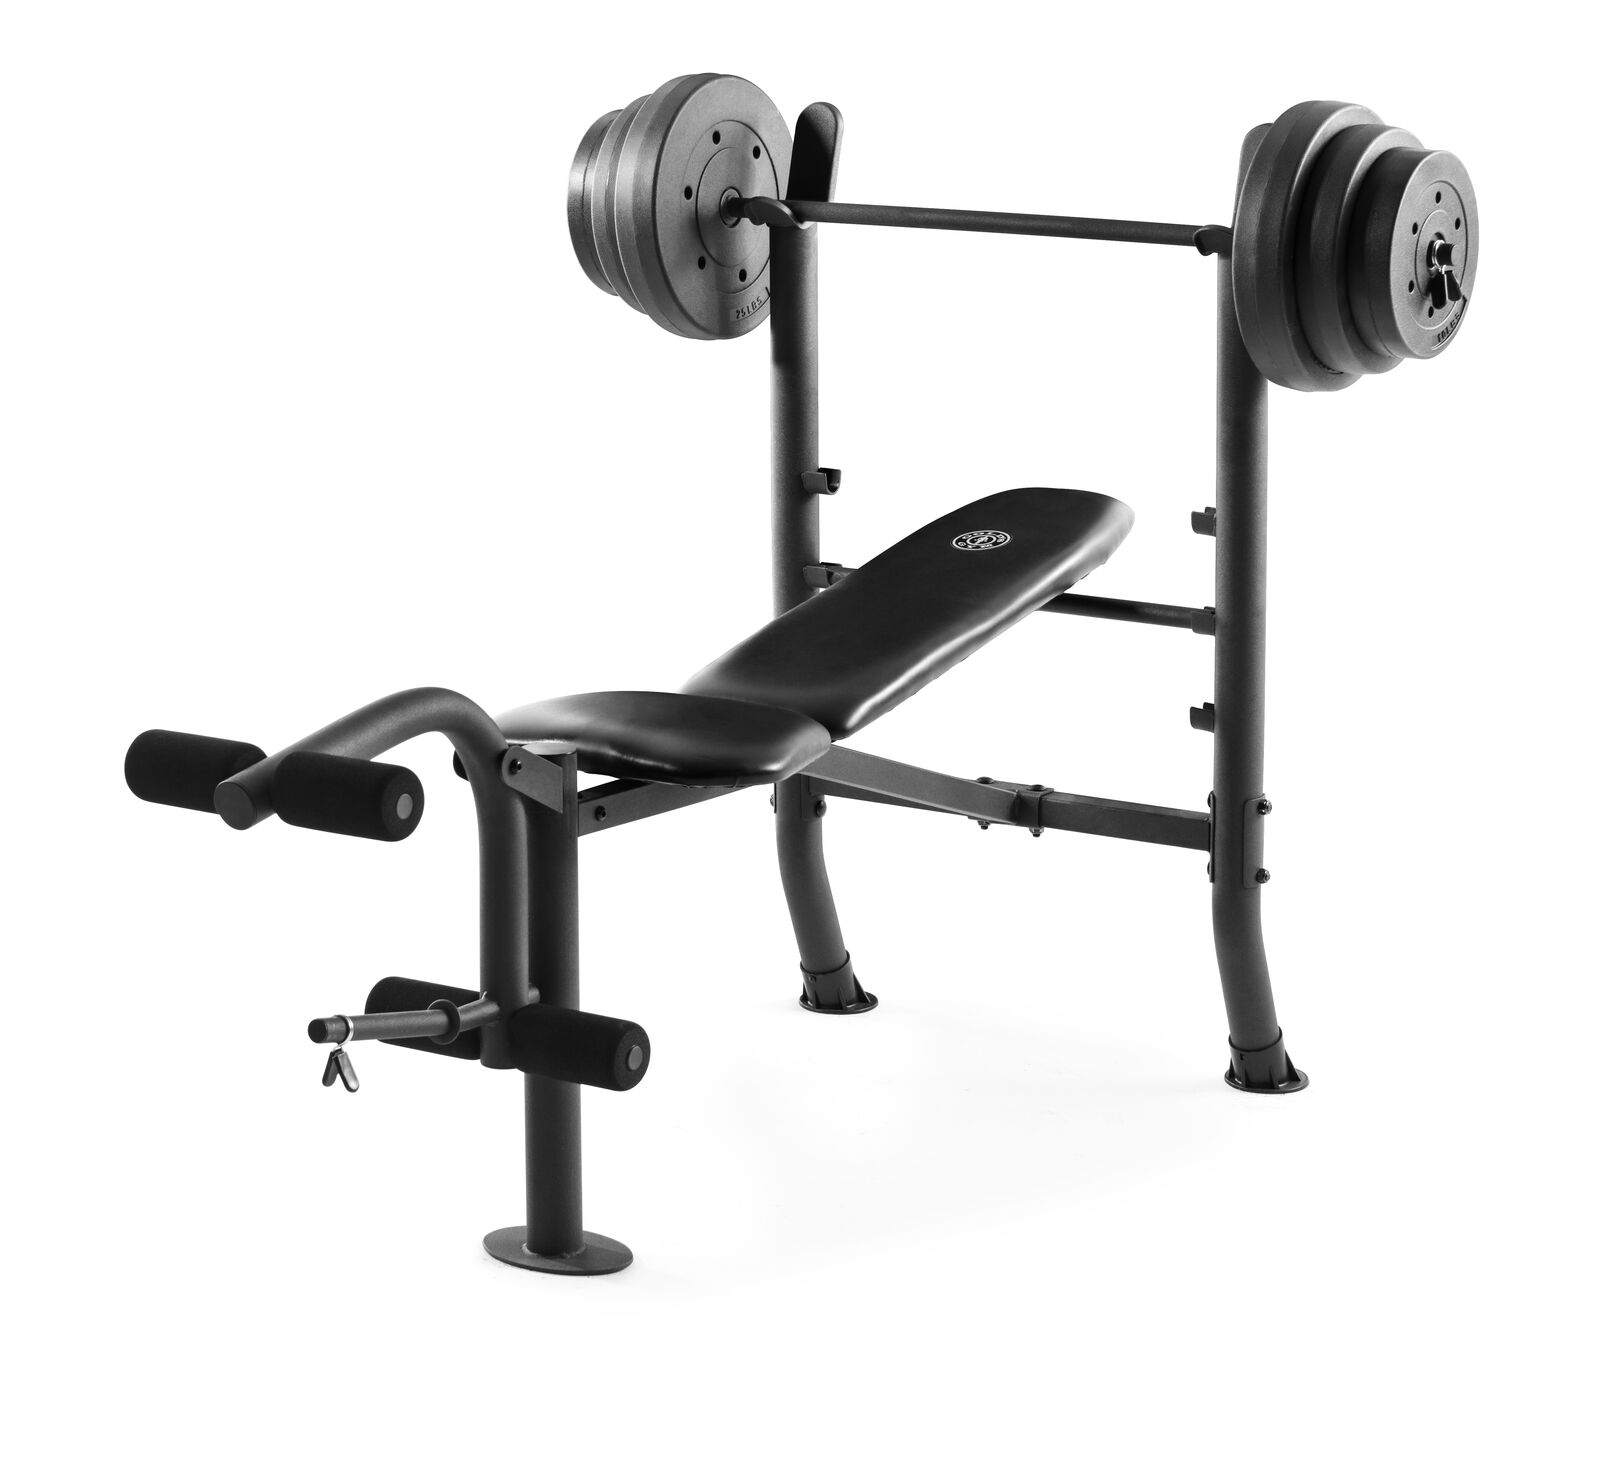 Combo Weight Bench Press with 100 Lb Vinyl Weight Set Leg Curl Incline Decline